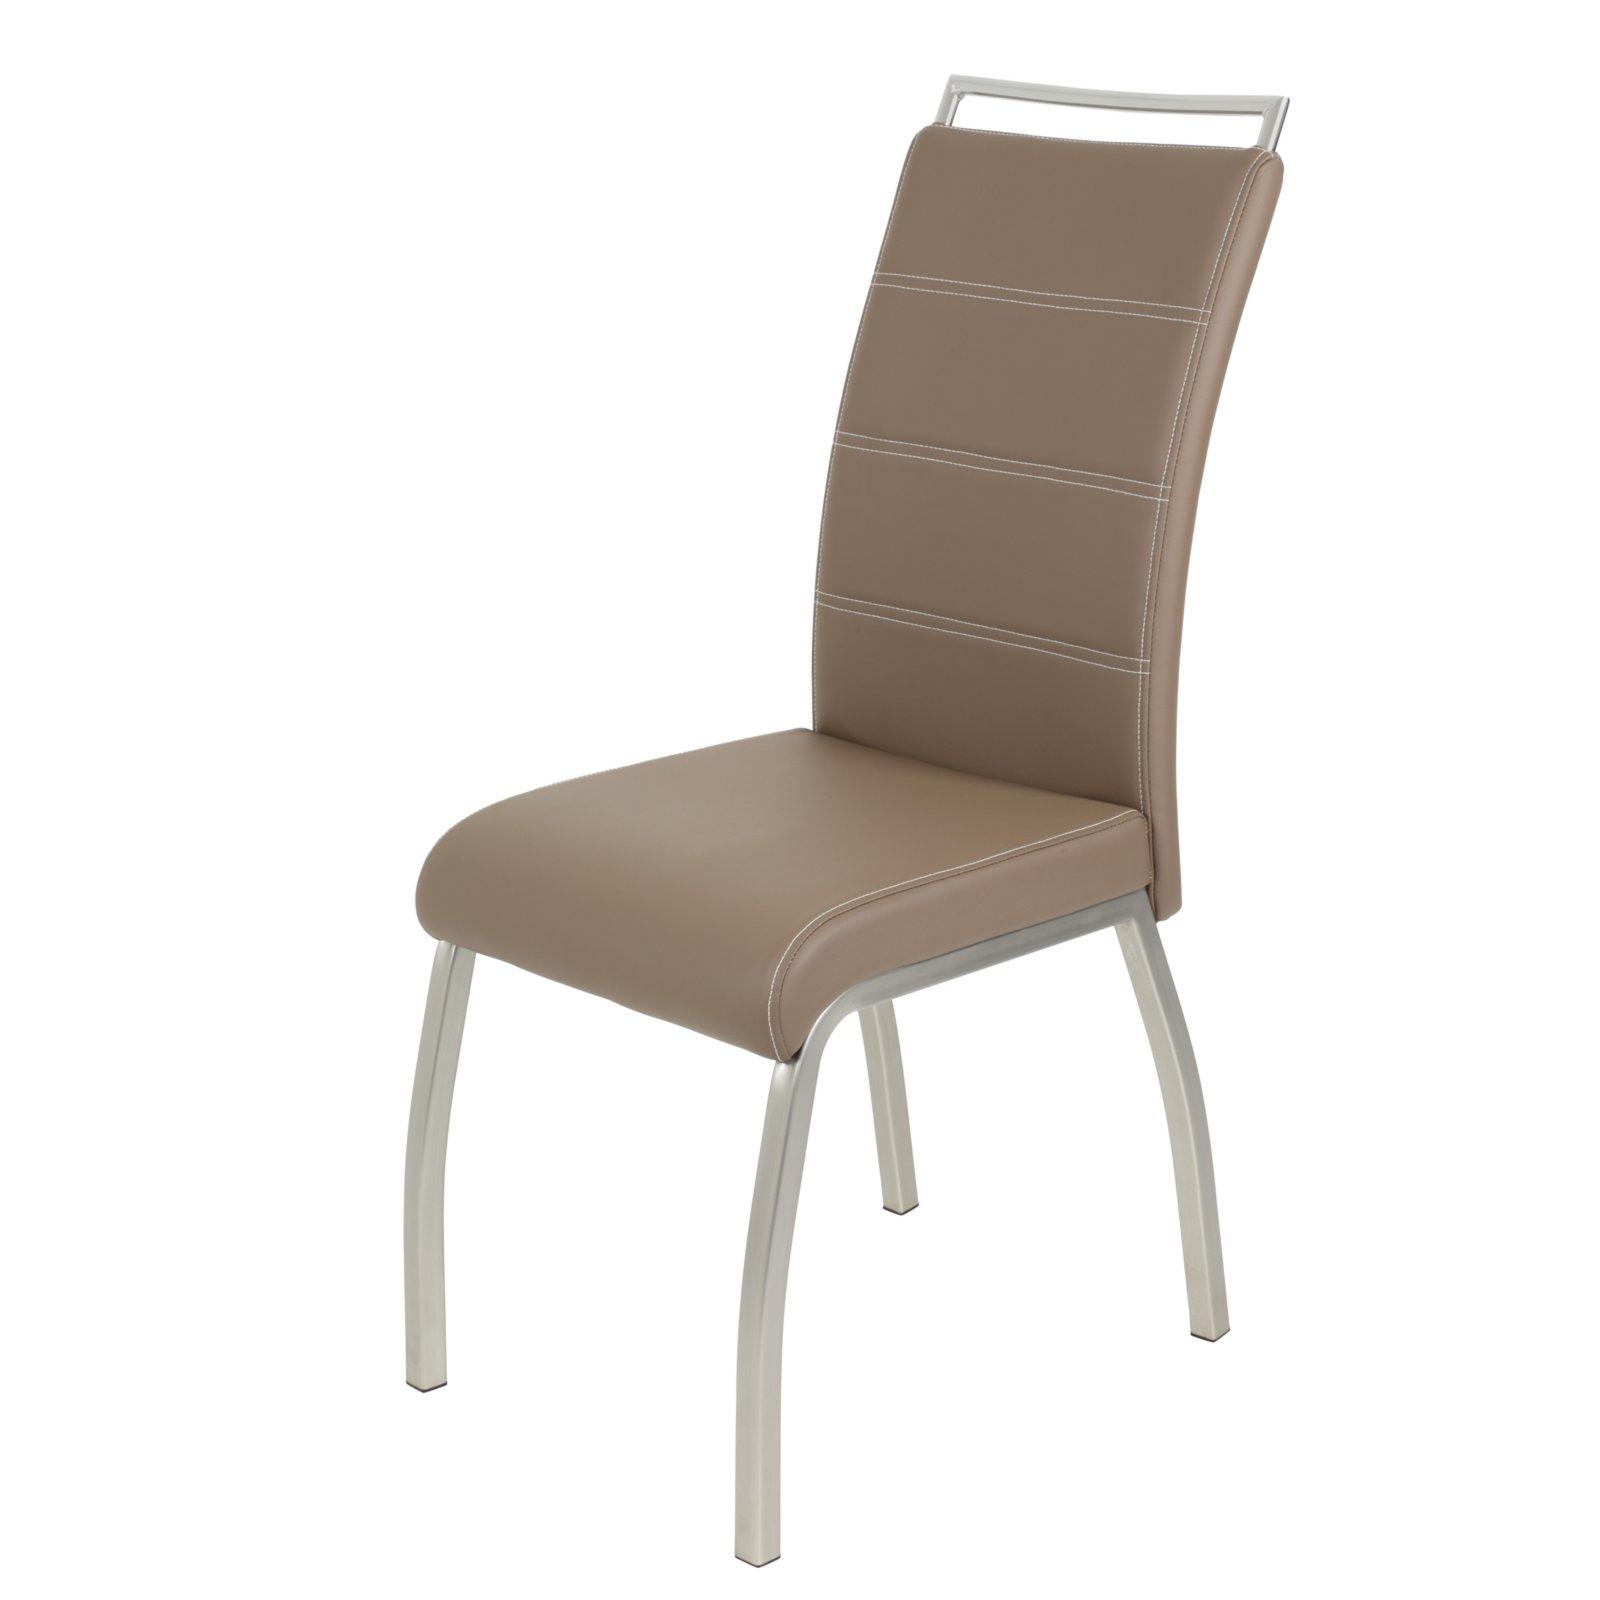 Stühle & Hocker - Bürostühle, Drehstühle - Günstig online bei ROLLER ...